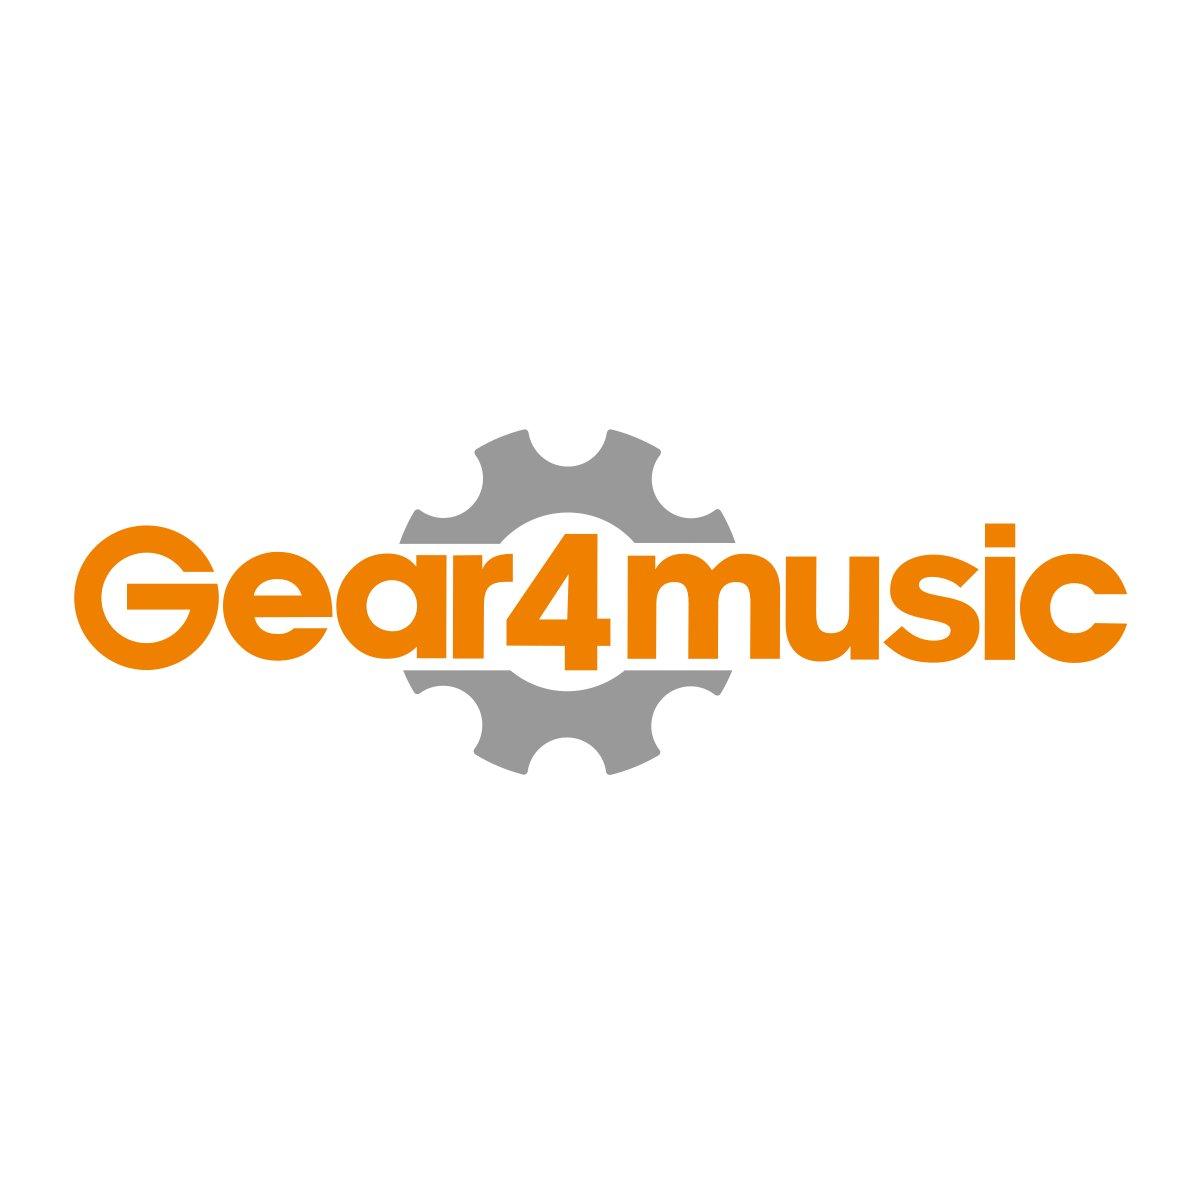 5-saitige Elektro-Akustik Bassgitarre von Gear4music